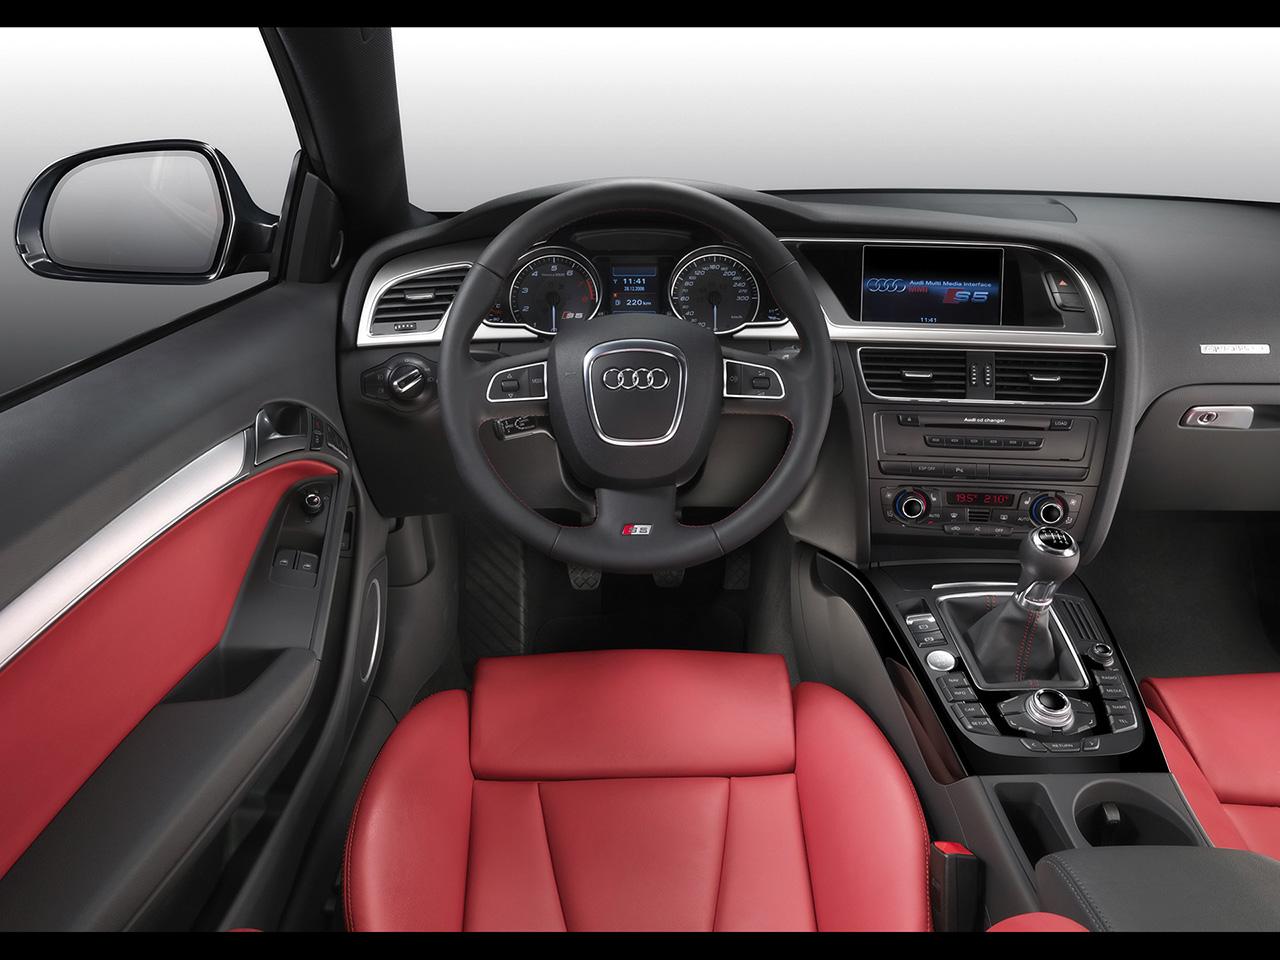 Best Wallpapers: Audi S5 Wallpapers